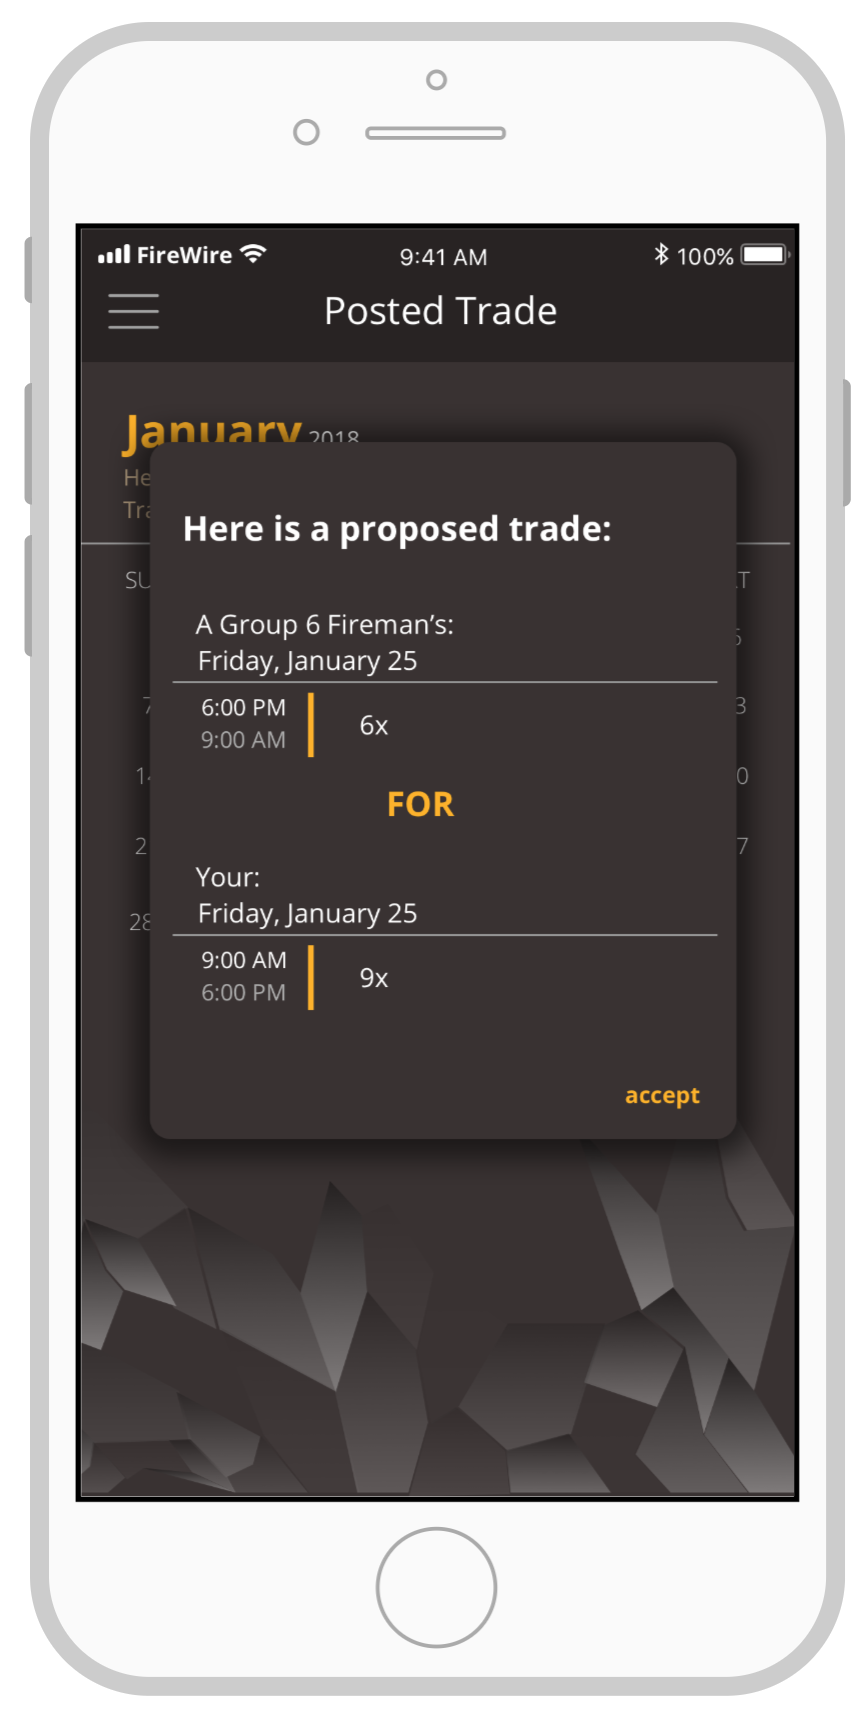 FireWire Trade